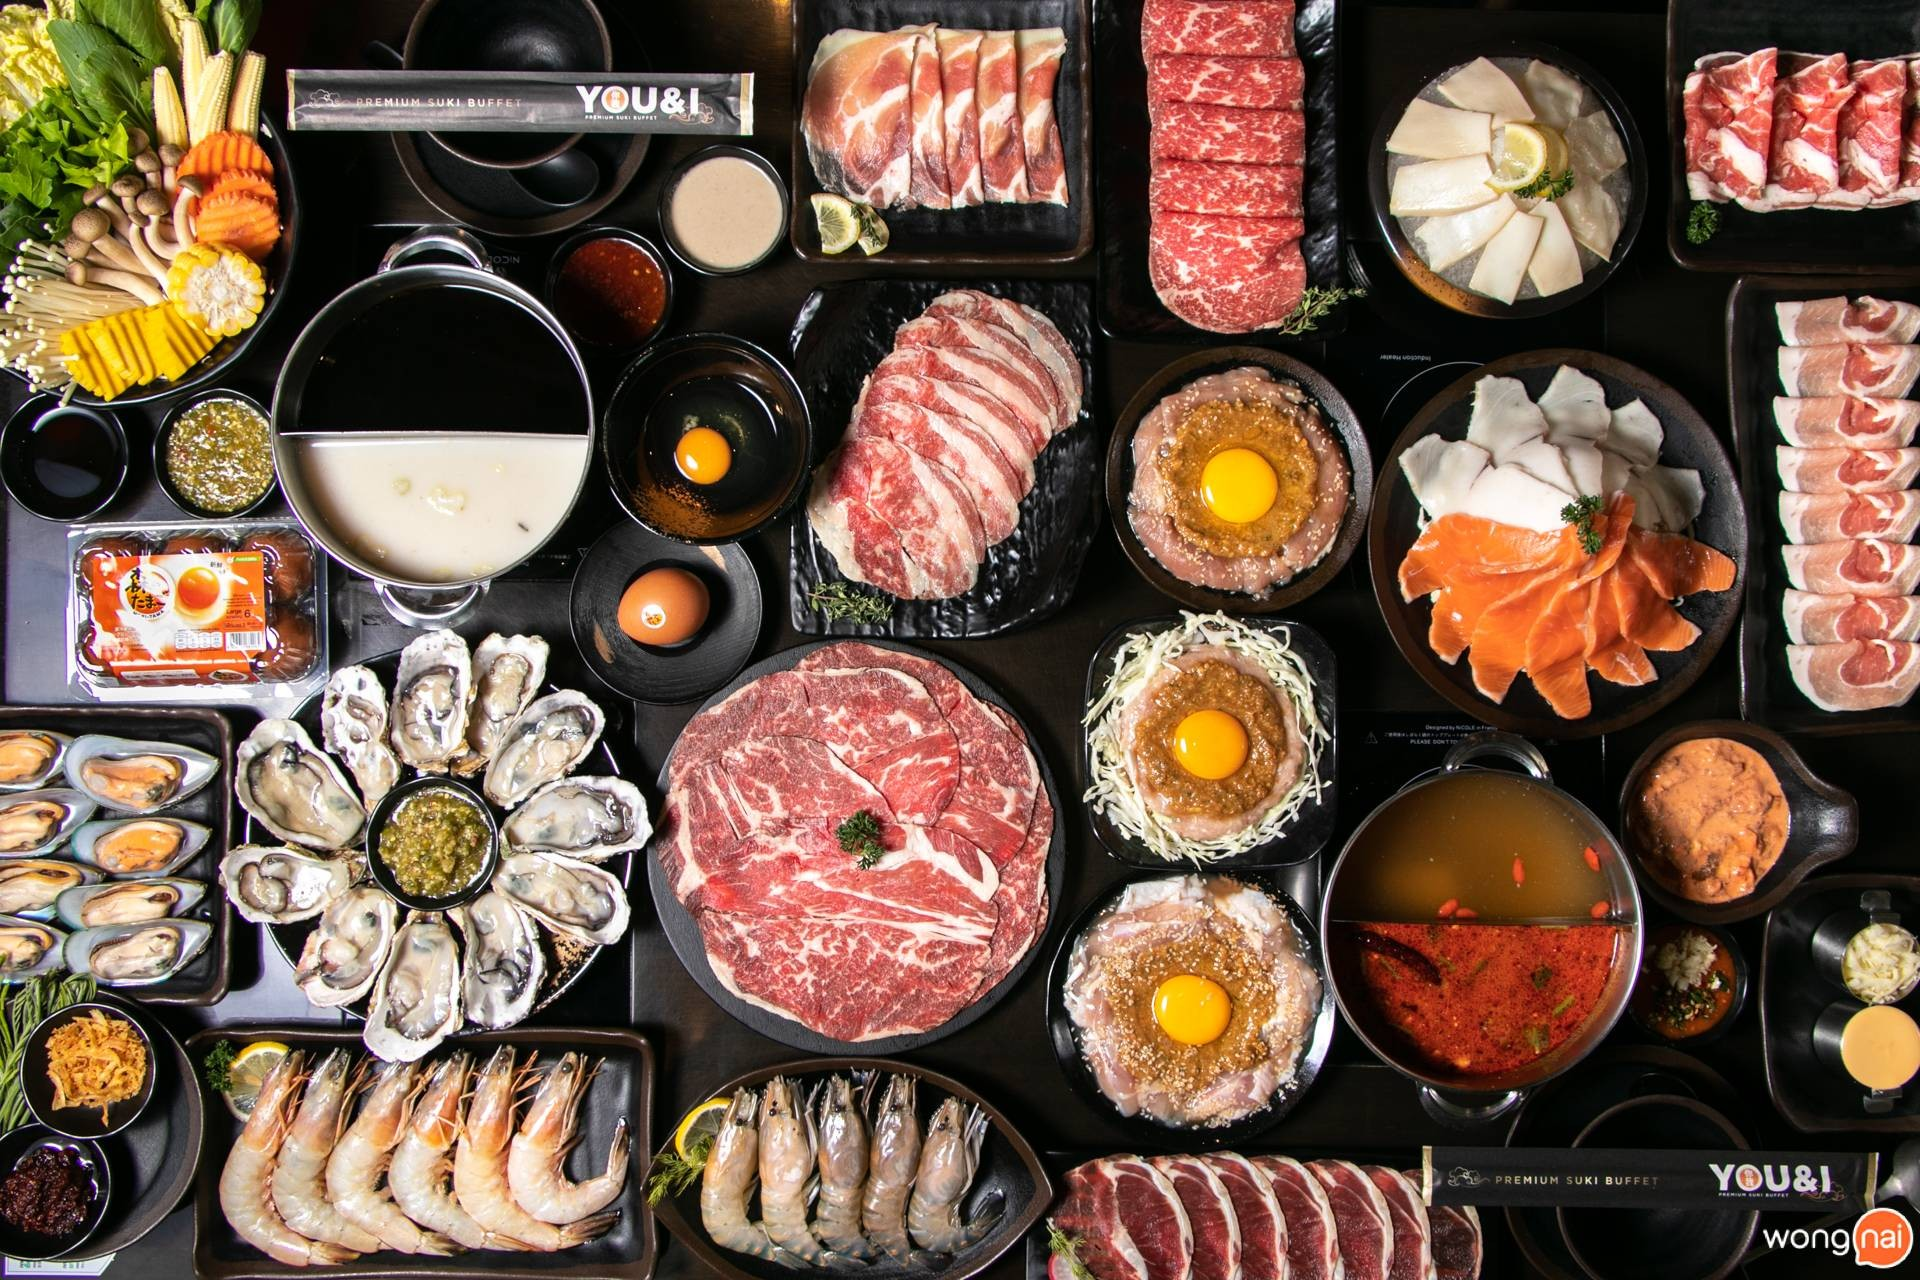 You & I Premium Suki Buffet เมกา บางนา